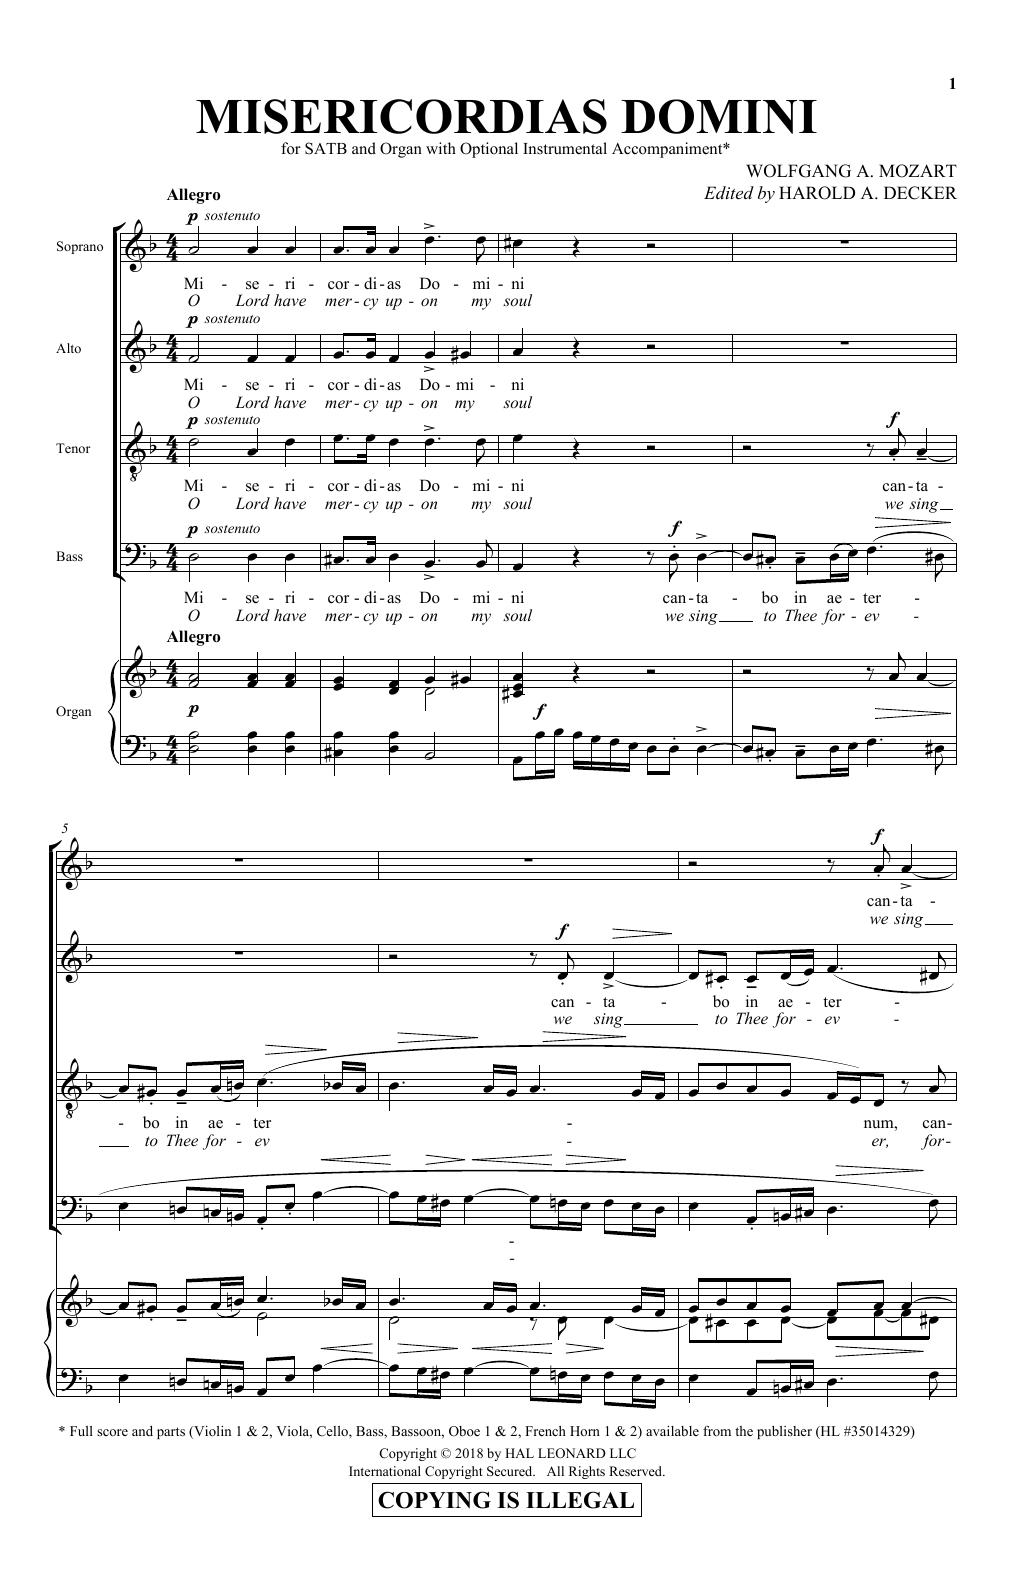 Misericordias Domini (SATB Choir)